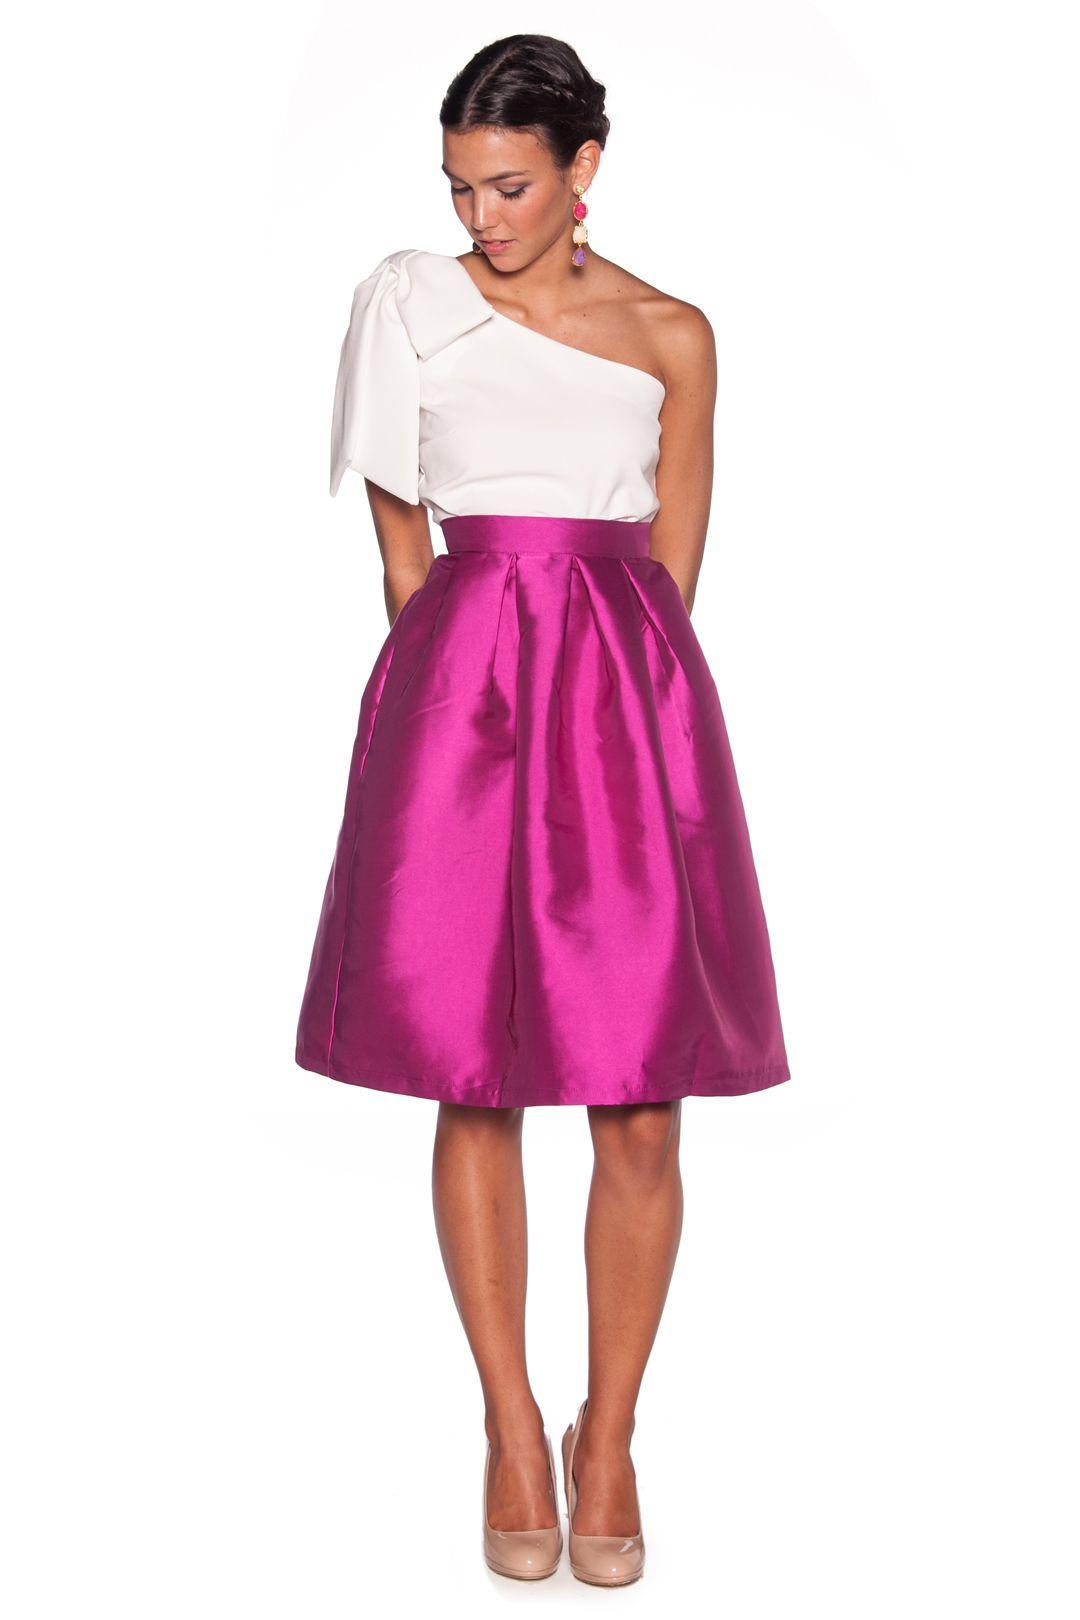 Falda midi con vuelo y top asimetrico | vestidos fiesta | Pinterest ...